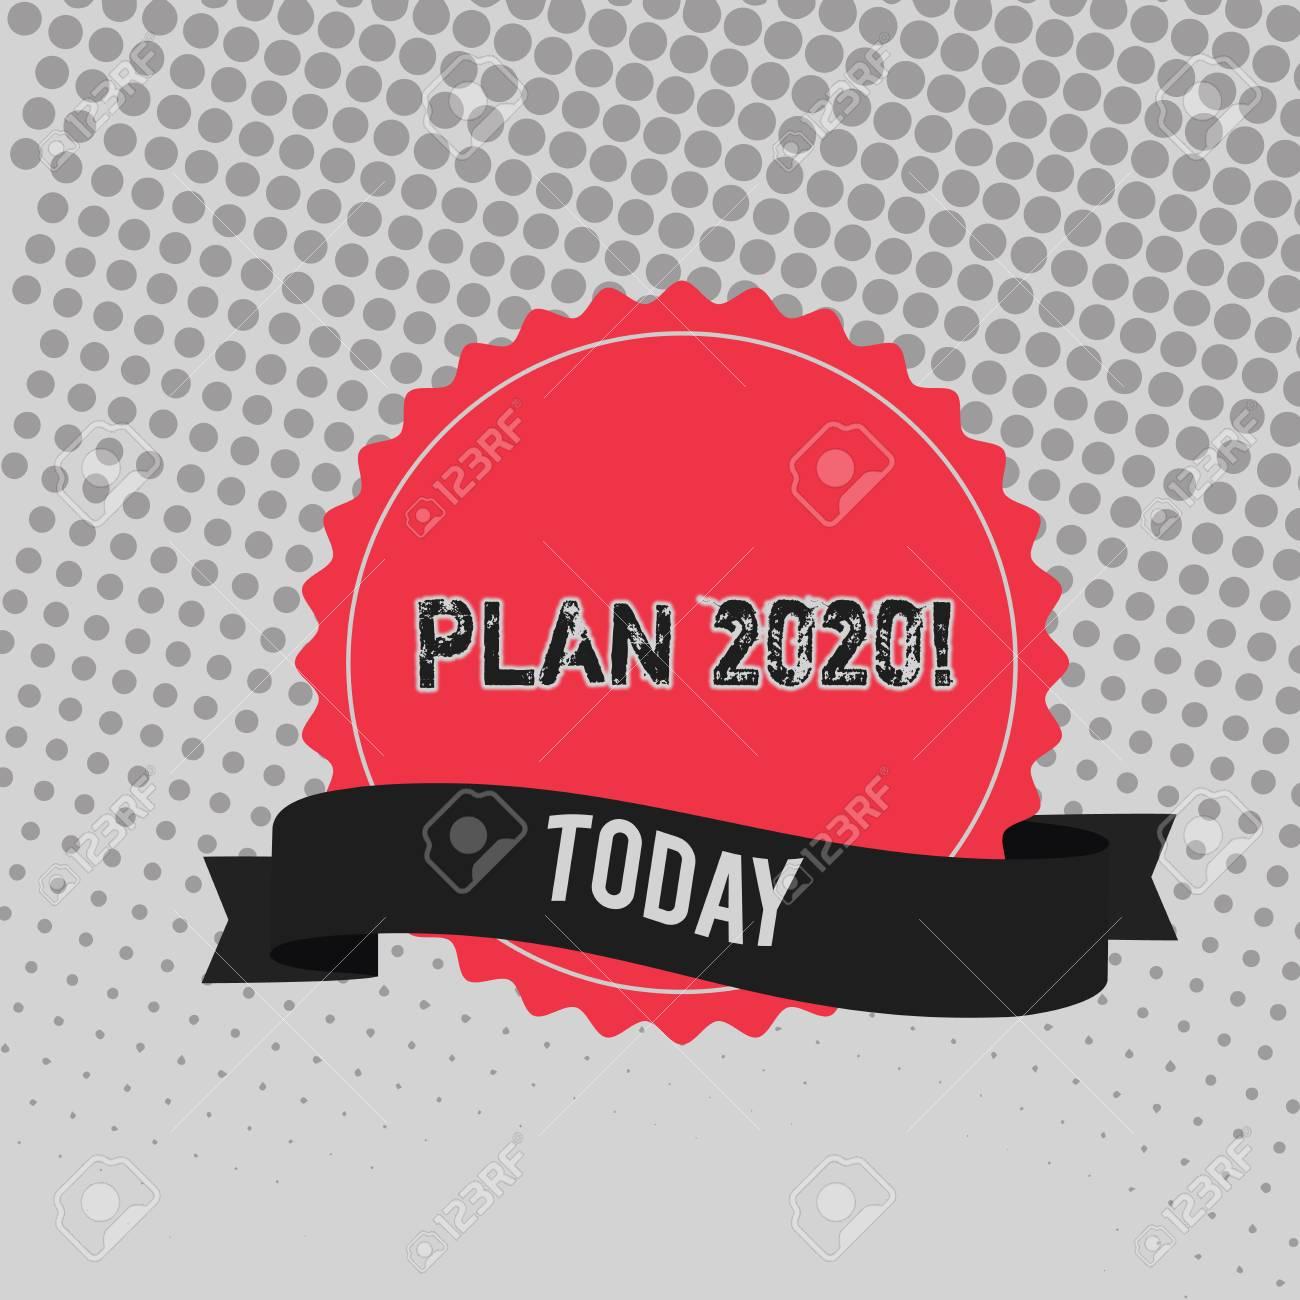 Jagged Edge Tour 2020 Handwriting Text Writing Plan 2020. Conceptual Photo Detailed